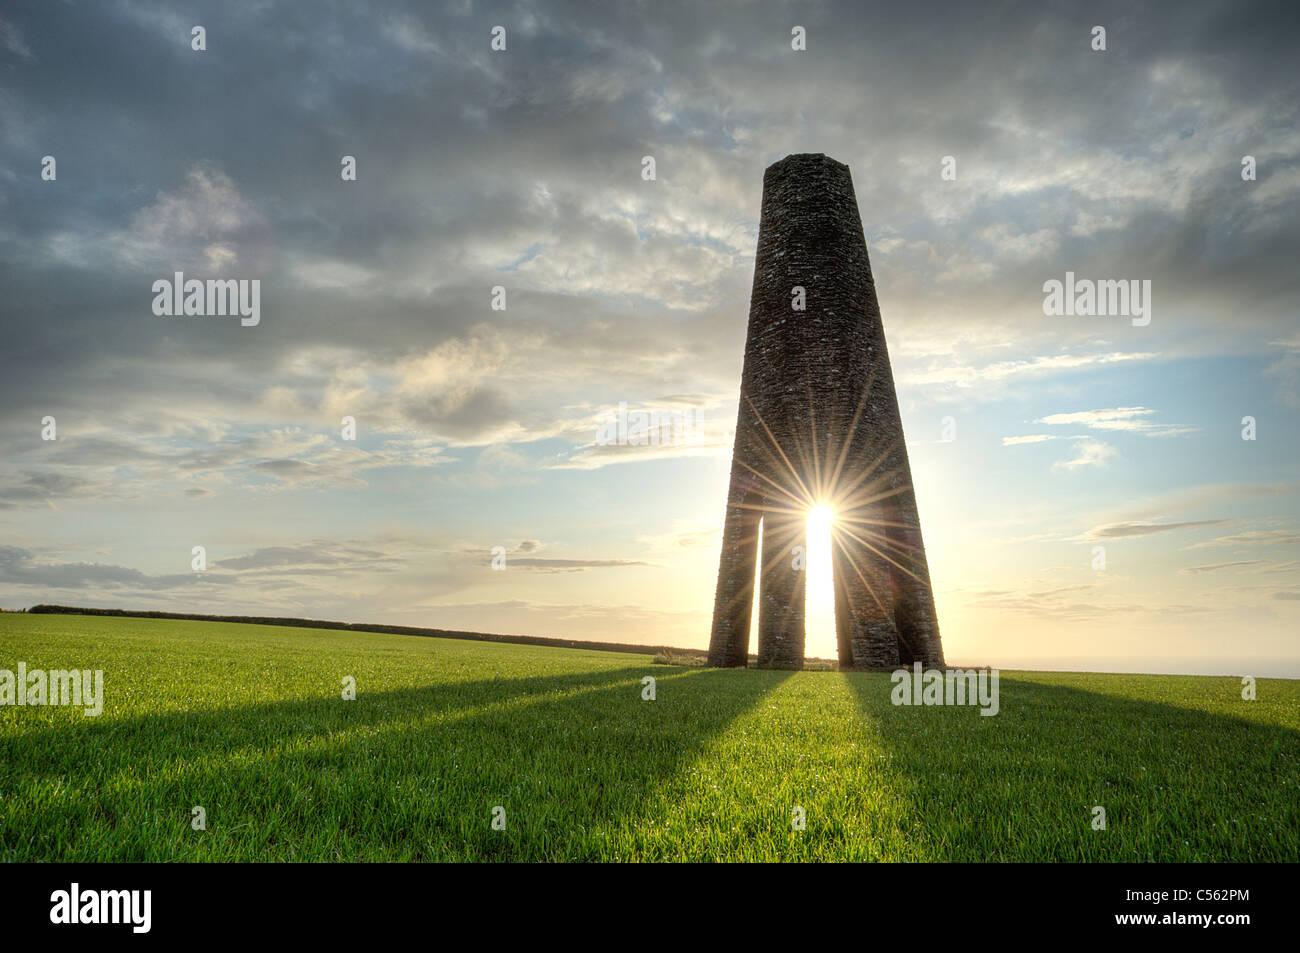 A summer sunrise through the Daymark navigation tower near Kingswear, South Devon. - Stock Image